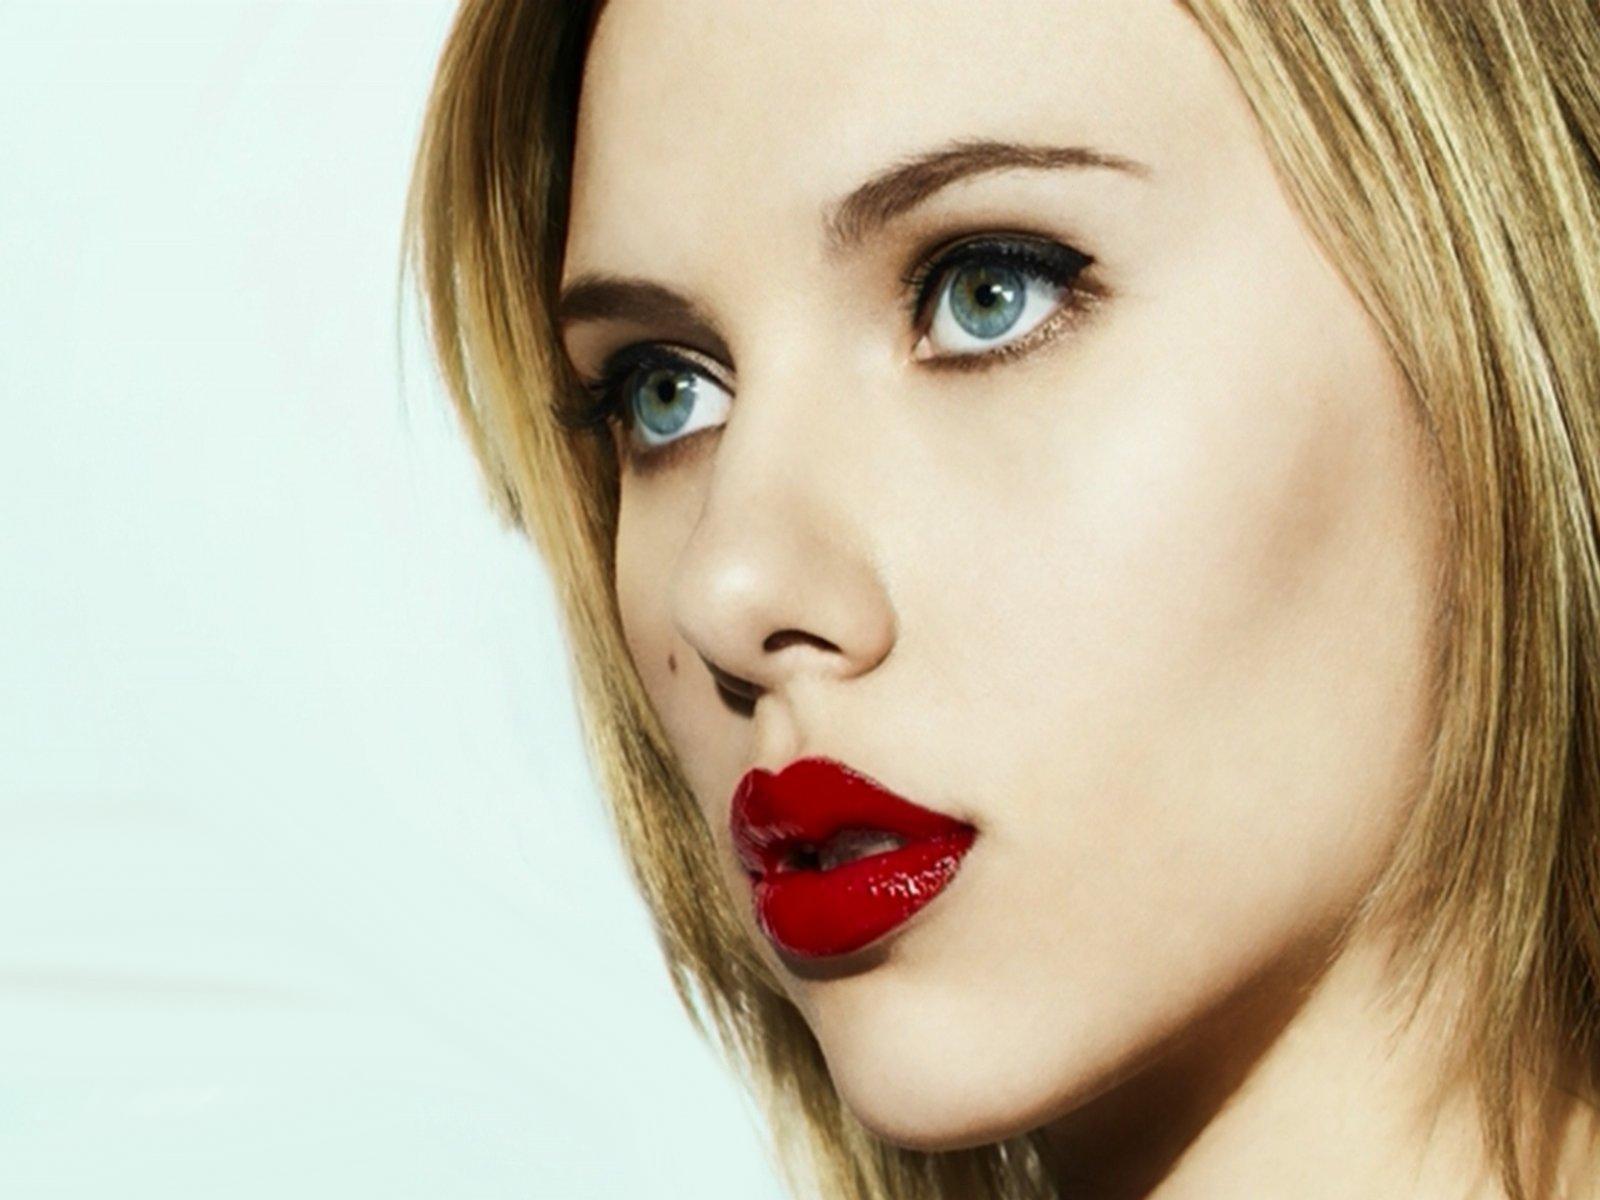 Scarlett Johansson Wallpapers Hd Desktop Backgrounds Images And